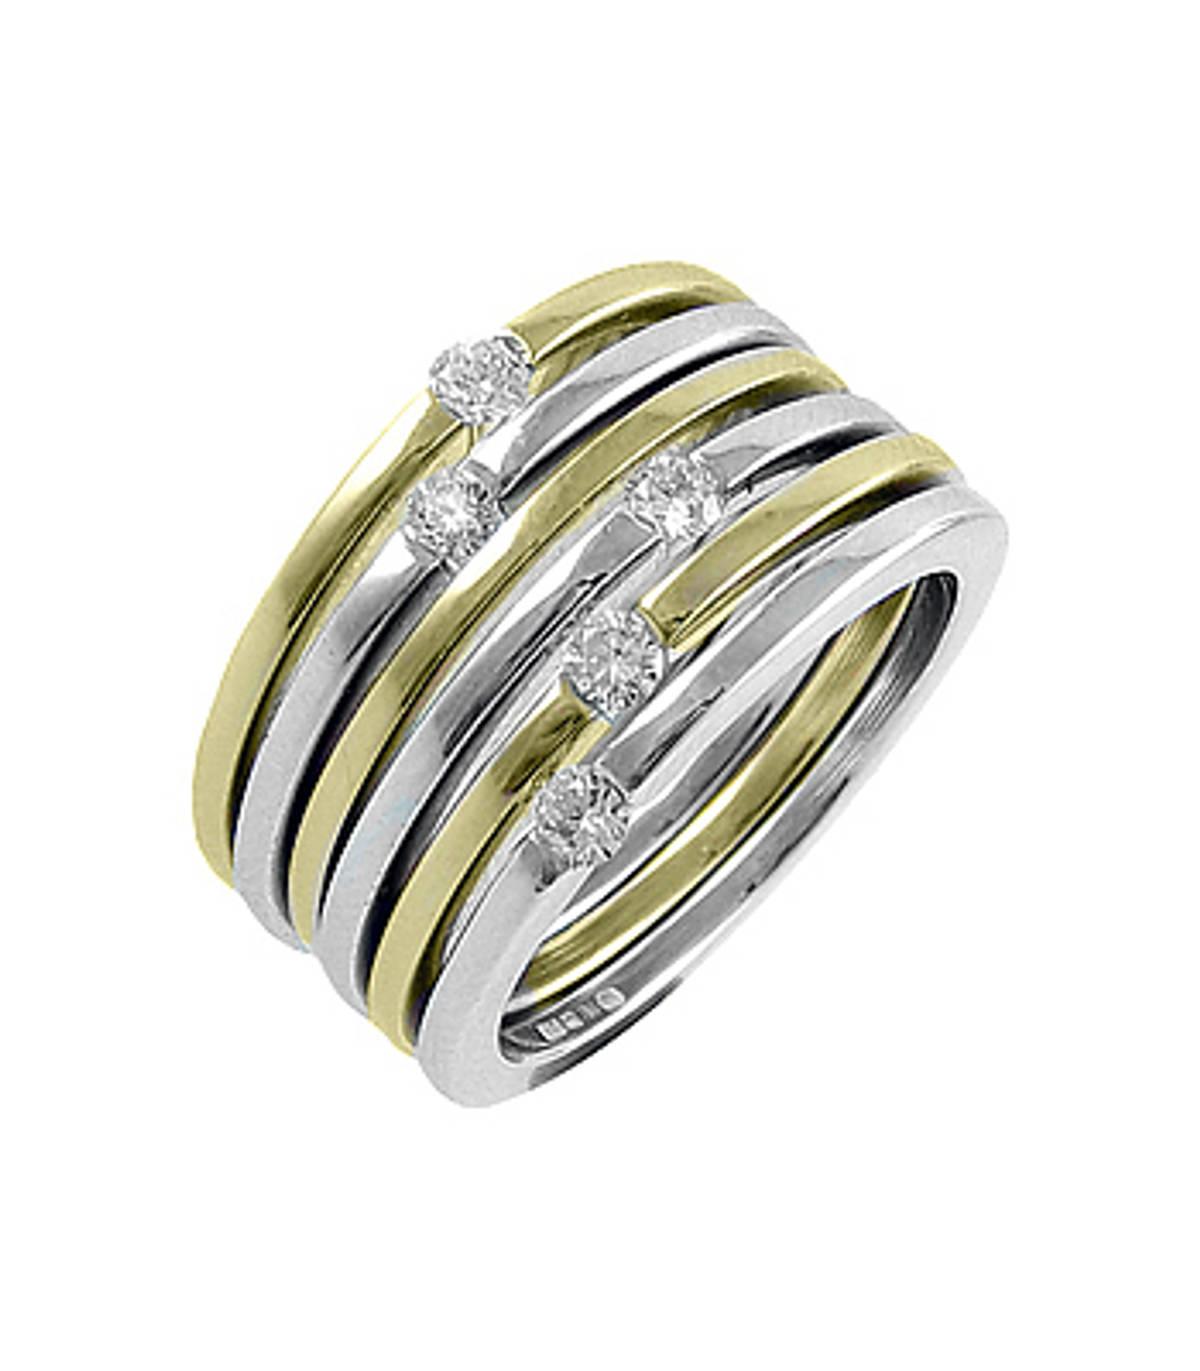 DR709295 stone diamond fancy ringPictured item: 0.30ct brilliant cut diamonds set in 18k yellow/white goldAvailable in: platinum